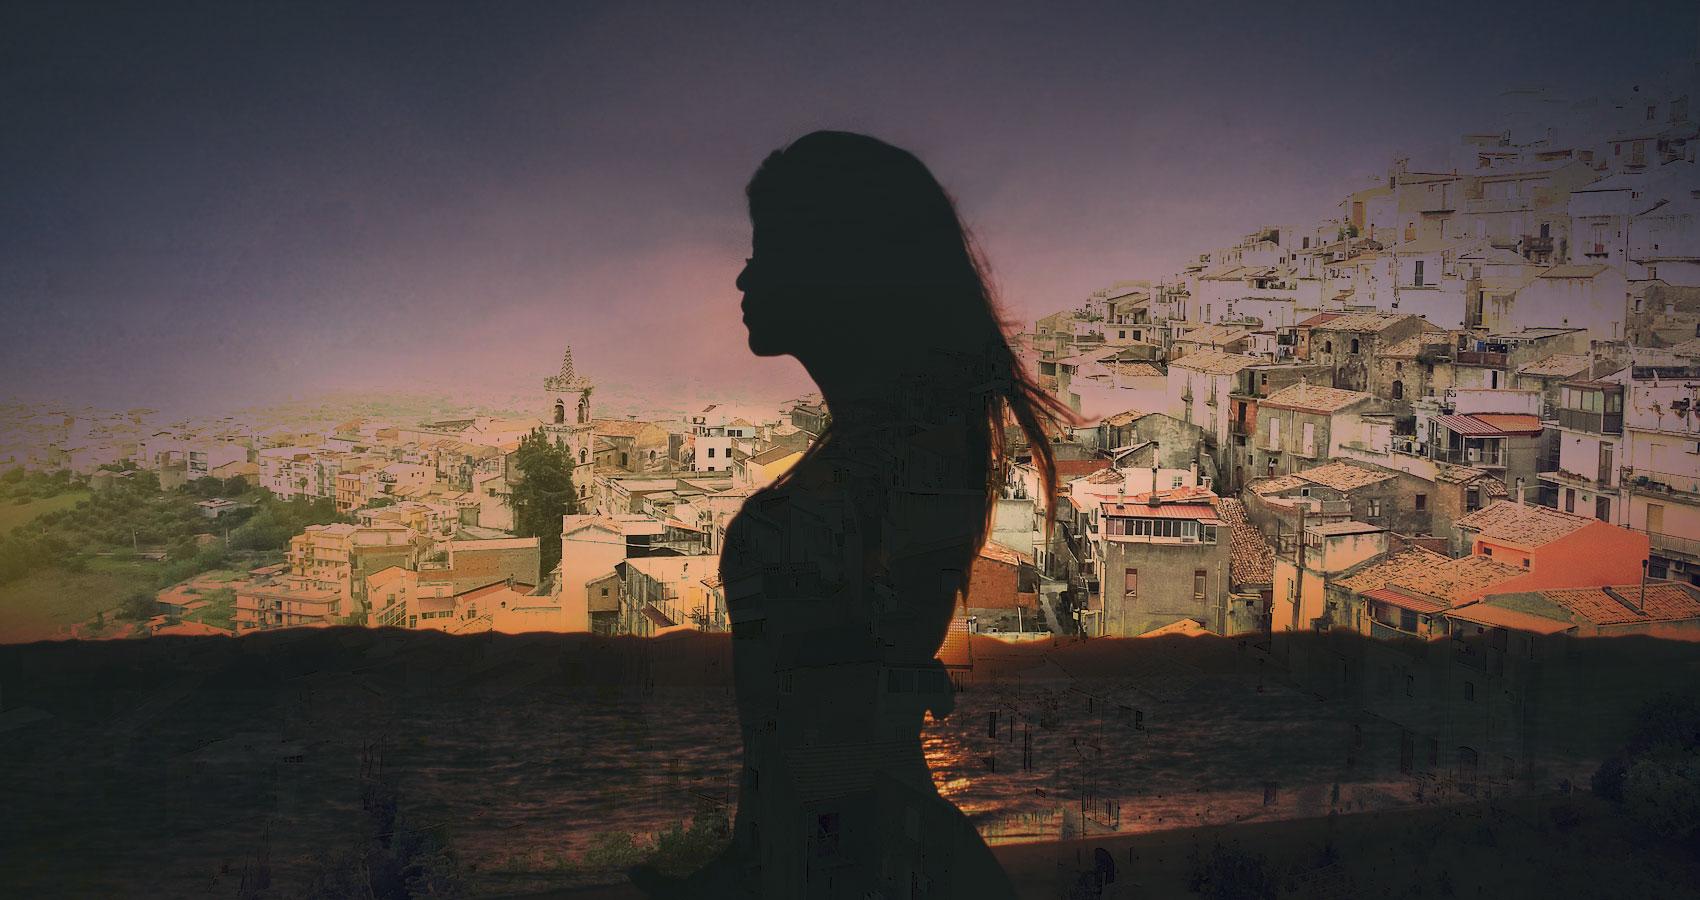 Her Name Was Aprile, a novel by Elisa Barbaro at Spillwords.com